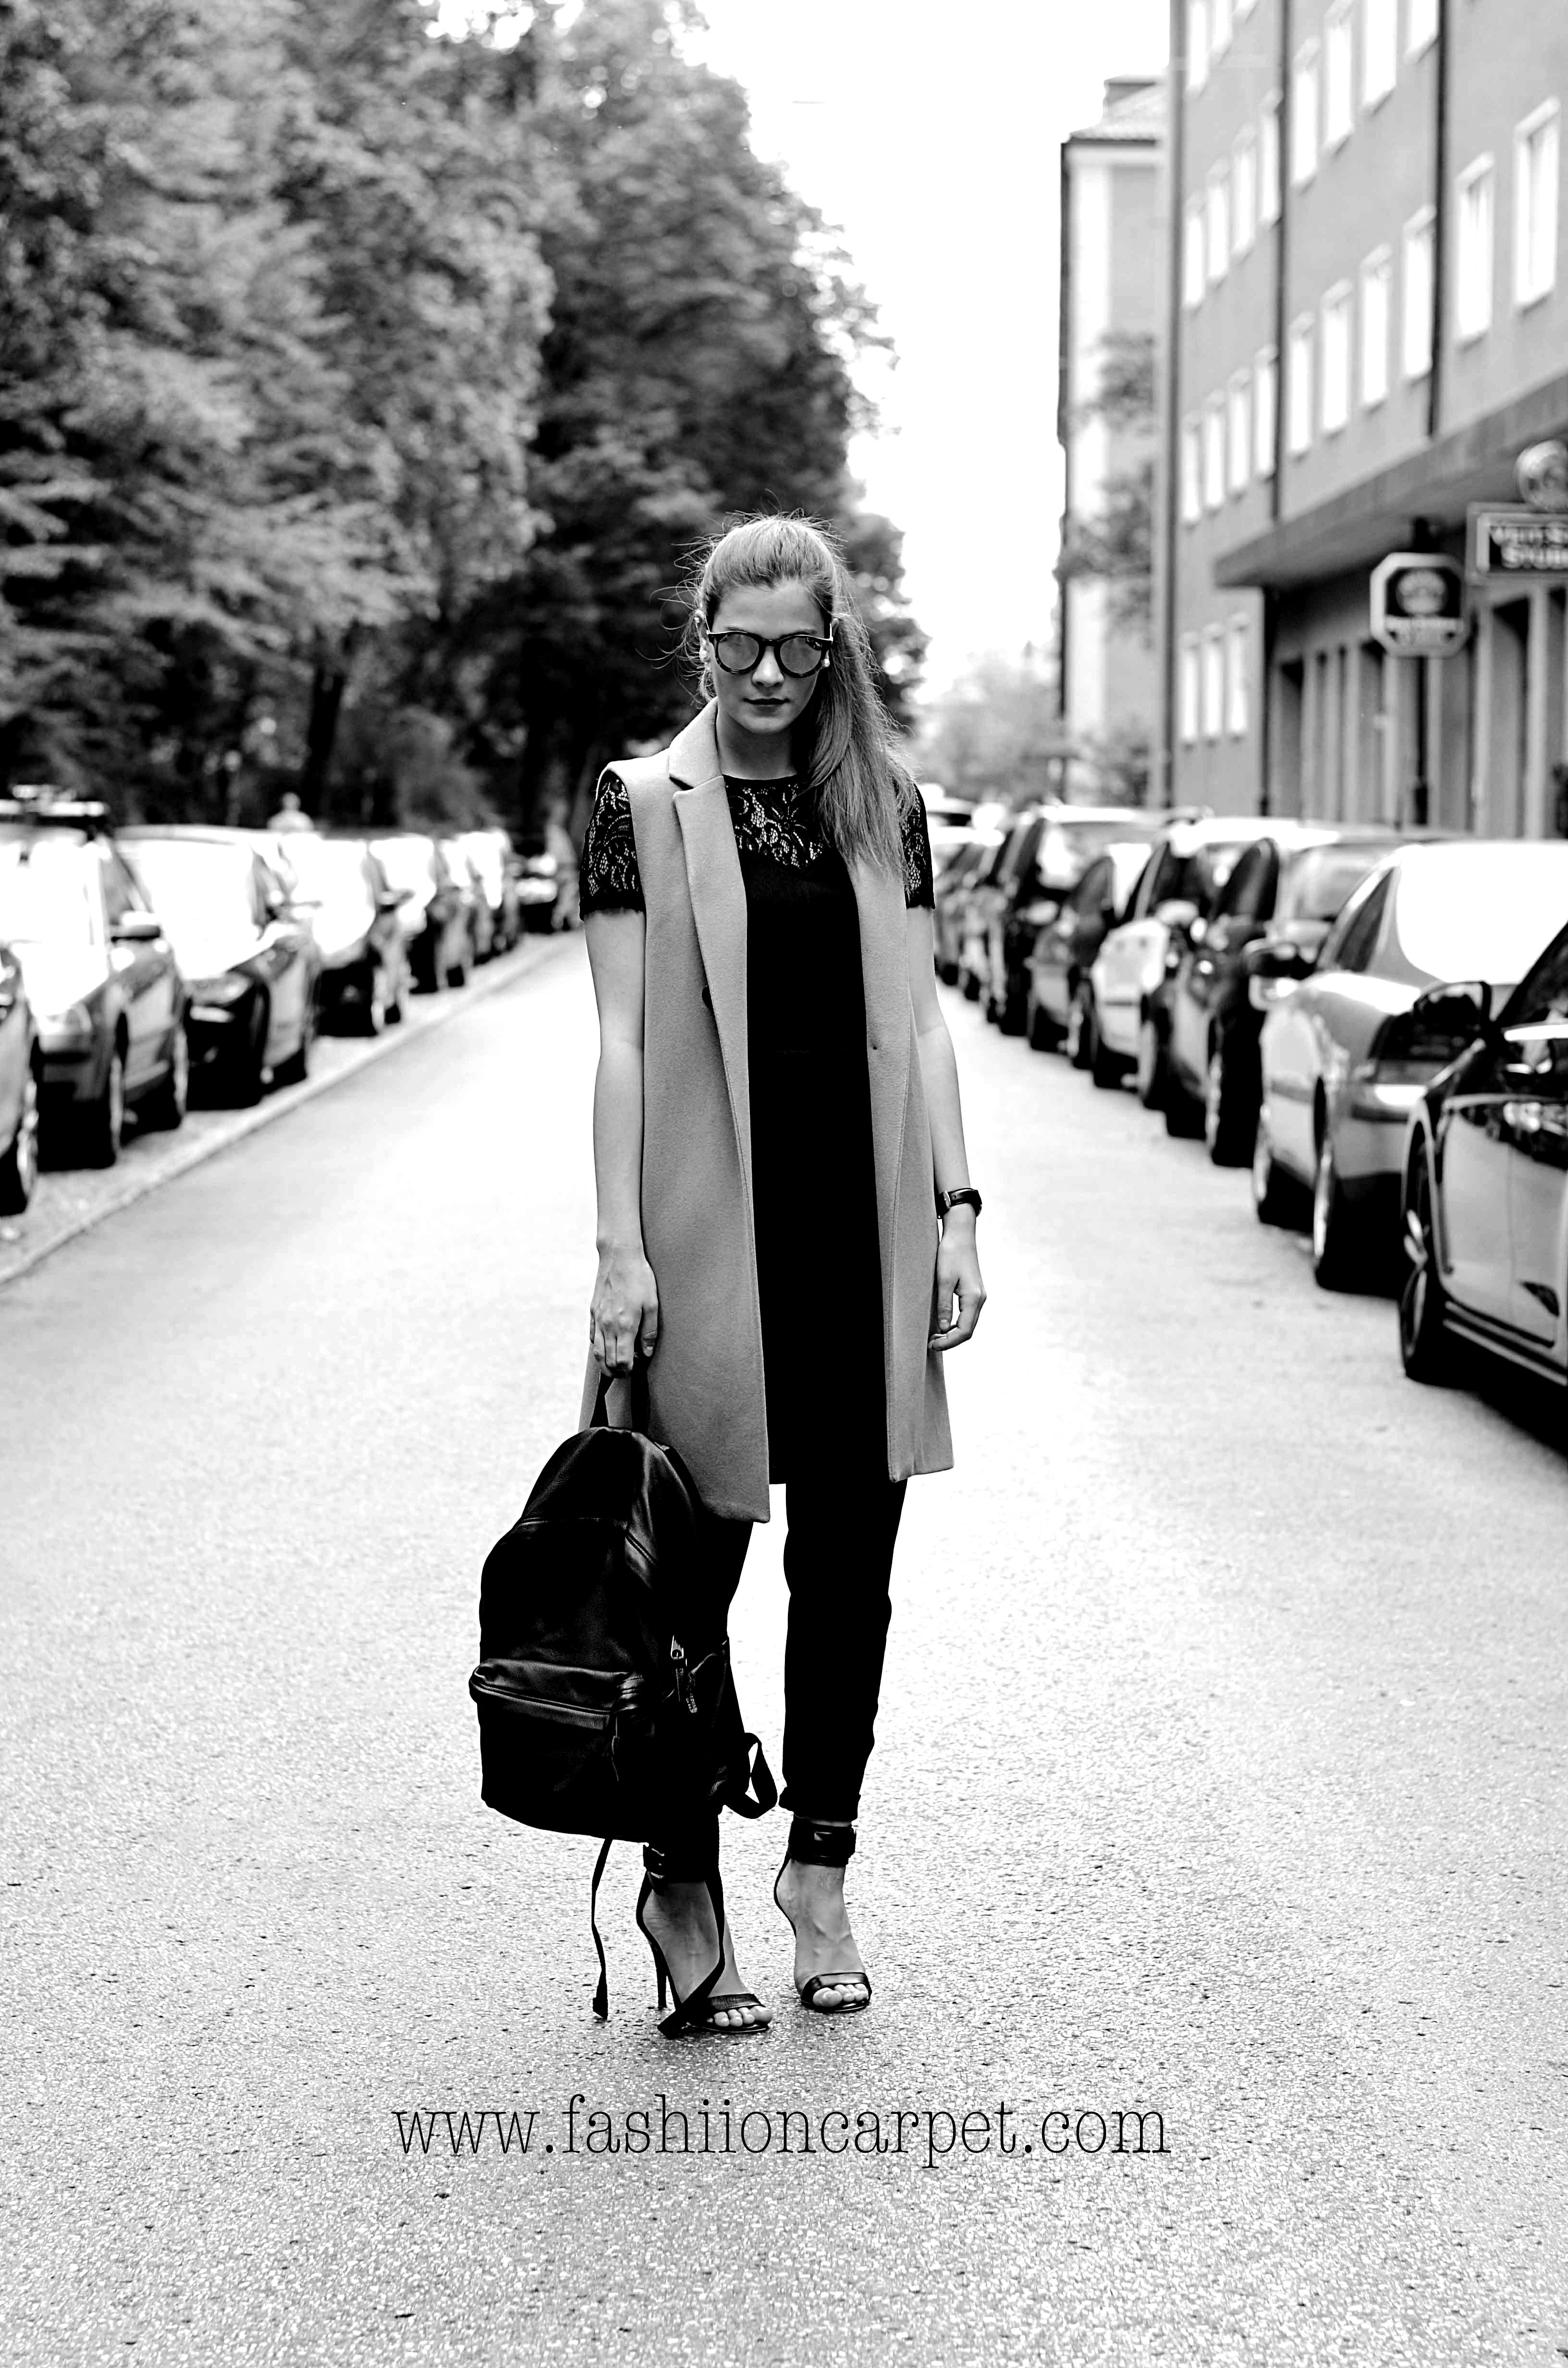 Mango-Lepecs-eastpak-zara-missguided-longweste-fashiioncarpet-outfit-mode-fashion-modeblogger-fashionblogger-fashionblog-münchen-blogger-blog-look-2